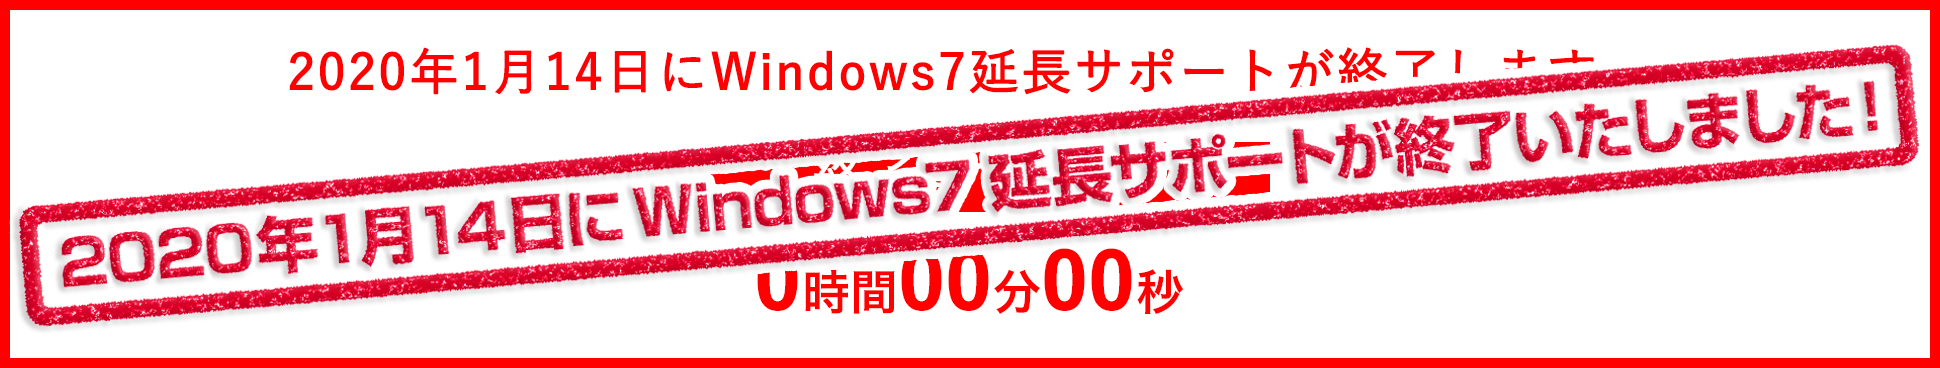 Windows7 サポート終了